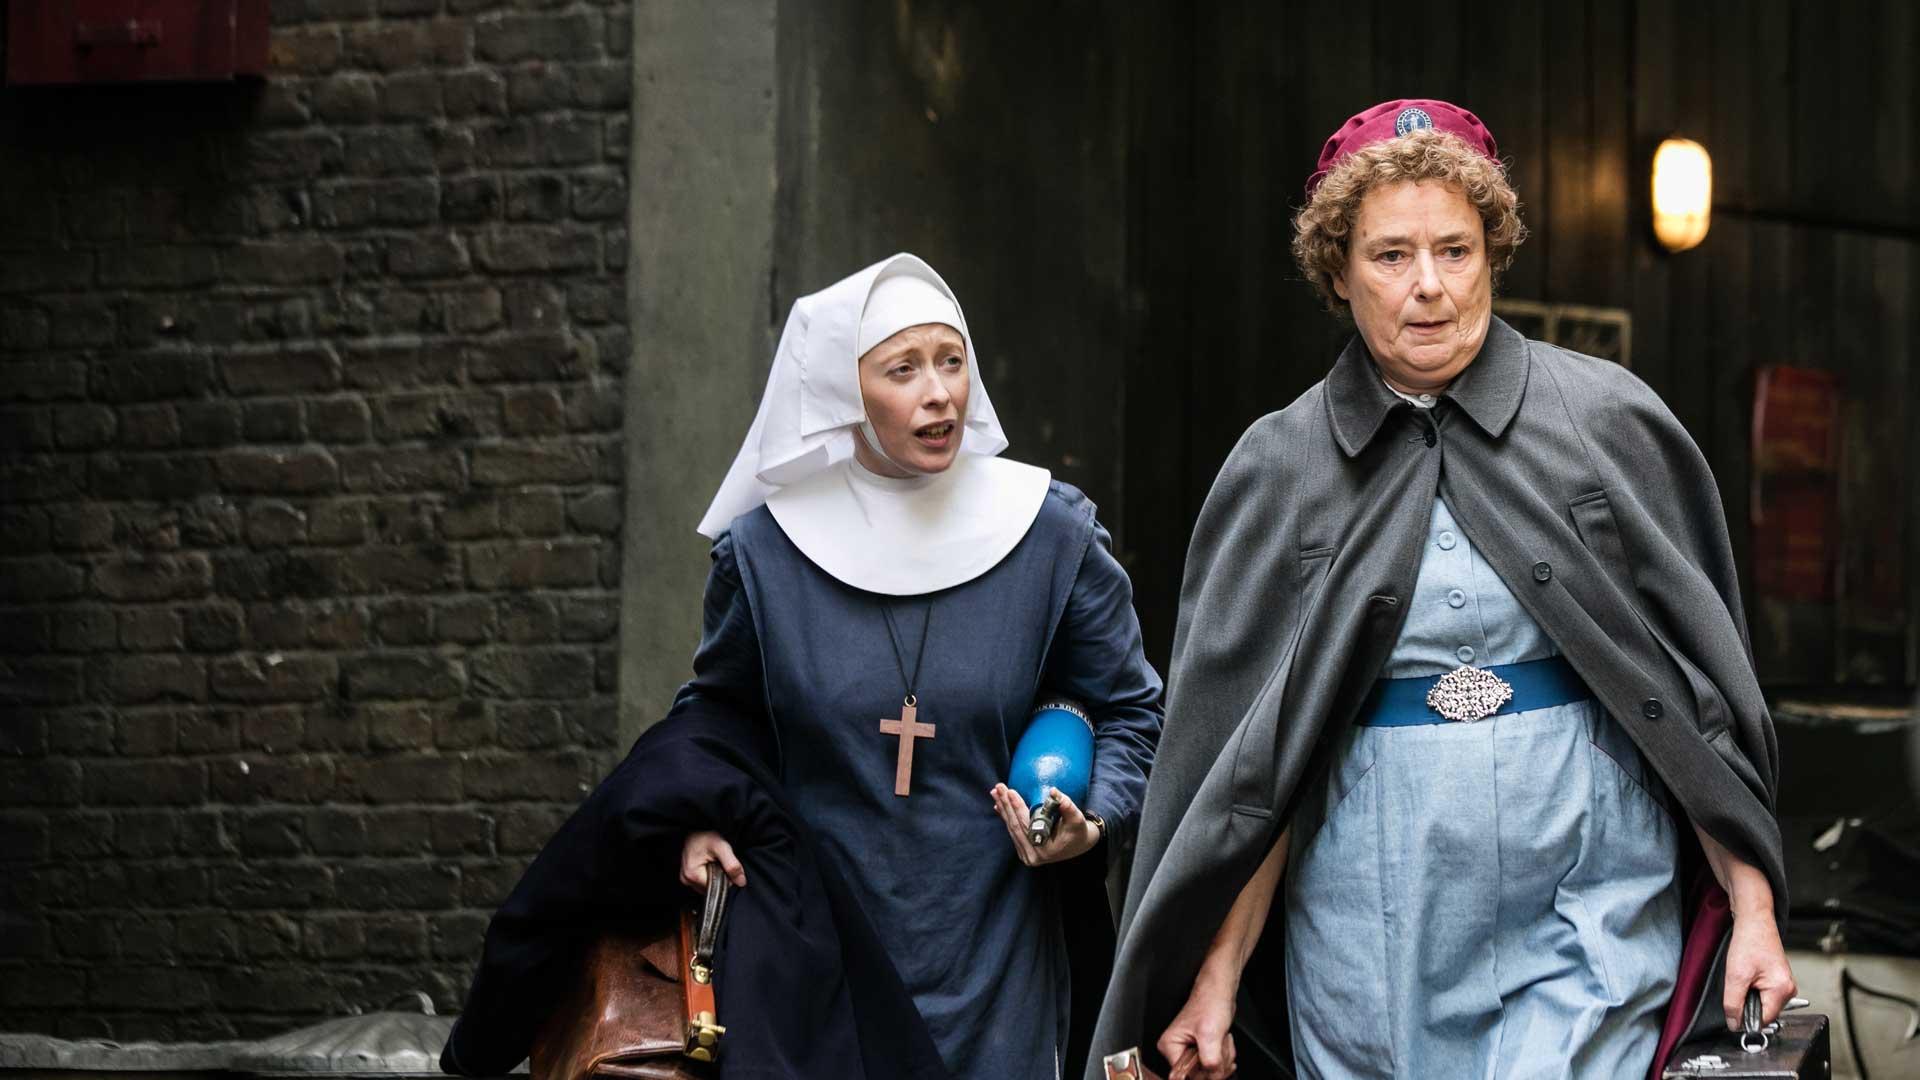 Victoria Yeates as Sister Winifred, Linda Bassett as Nurse Phyllis Crane